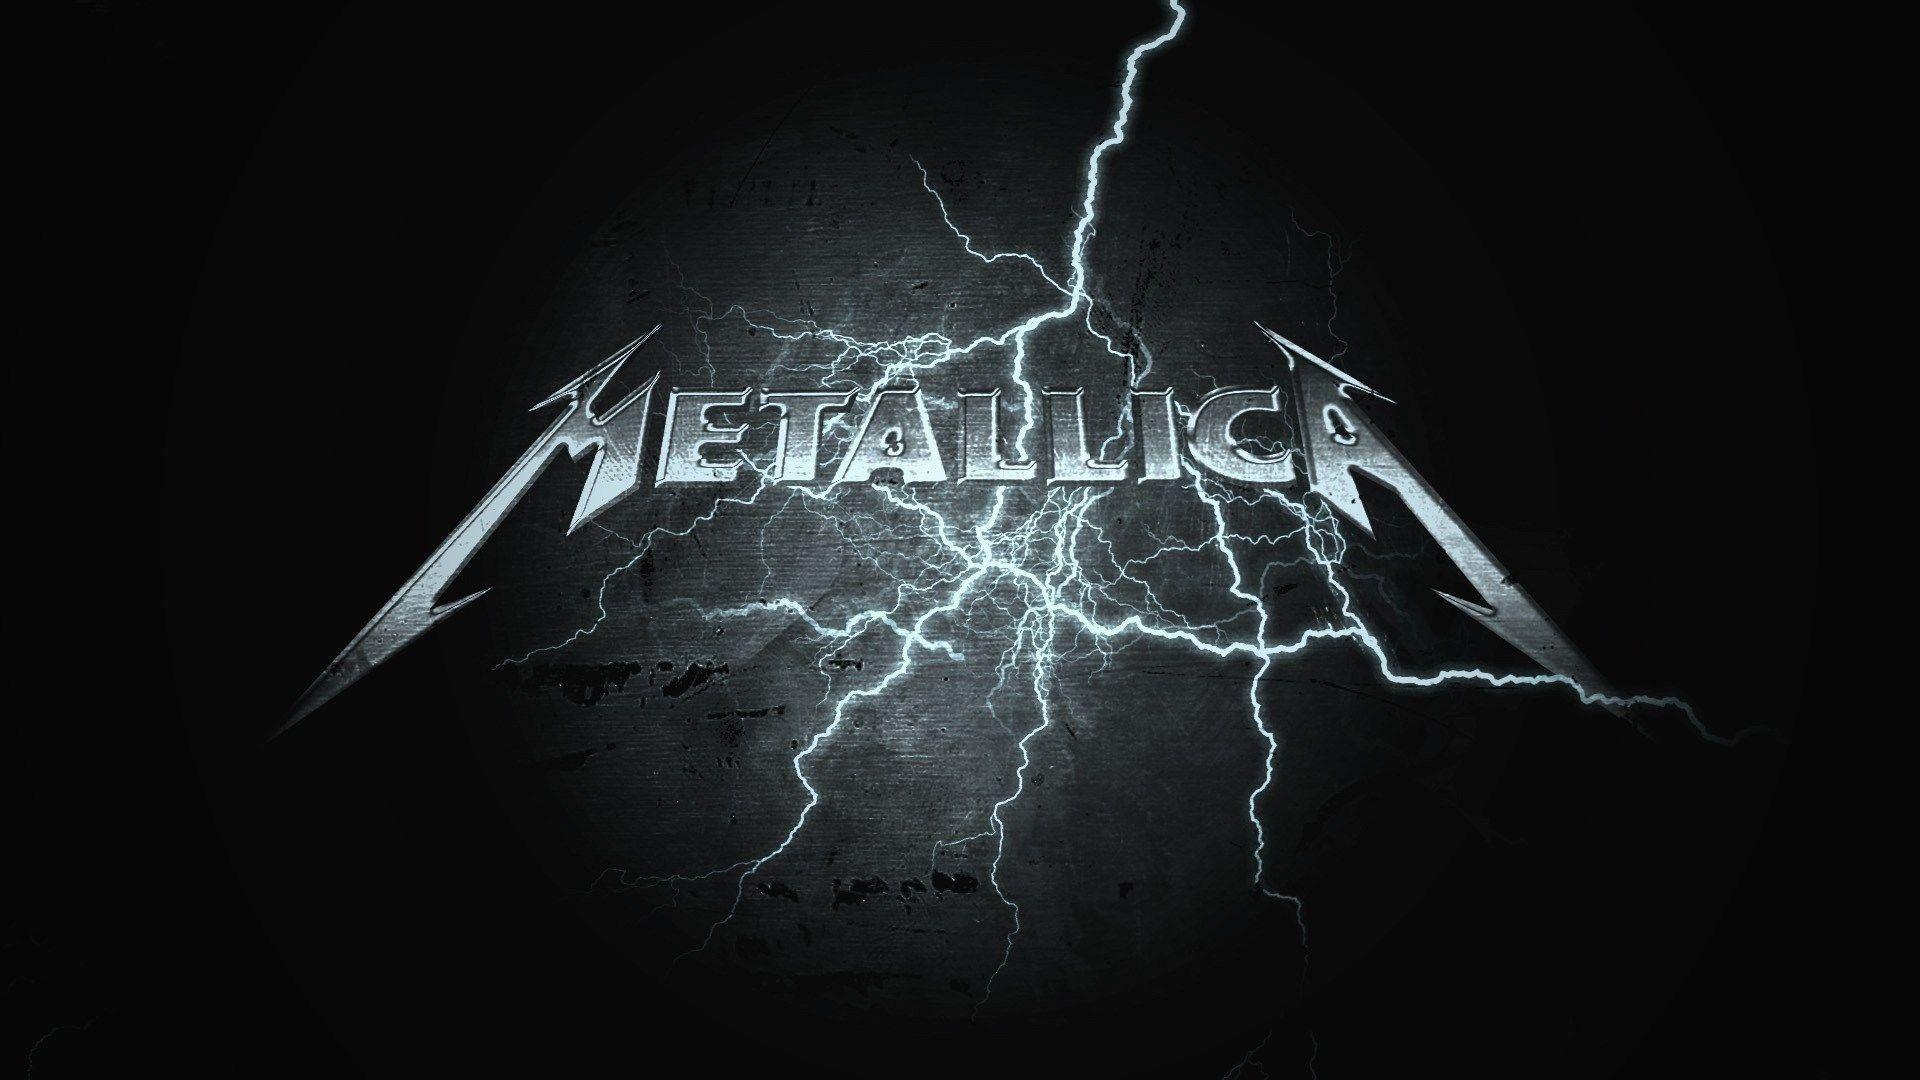 Metallica Wallpapers 3d - Wallpaper Cave